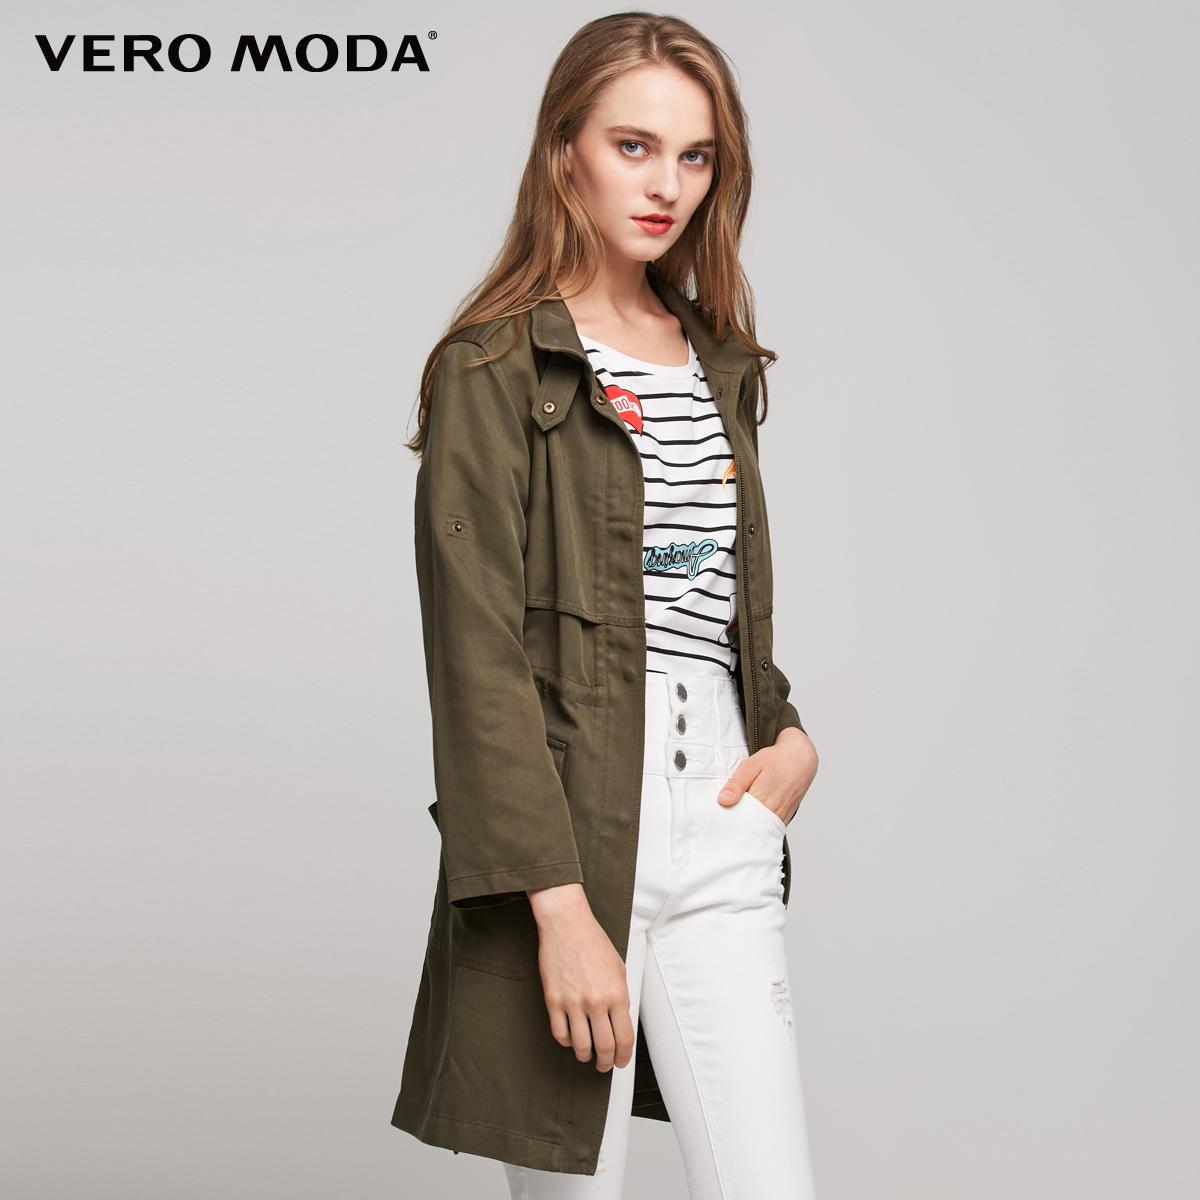 Vero Moda2017冬季新款军装风九分袖直筒风衣外套|317421501